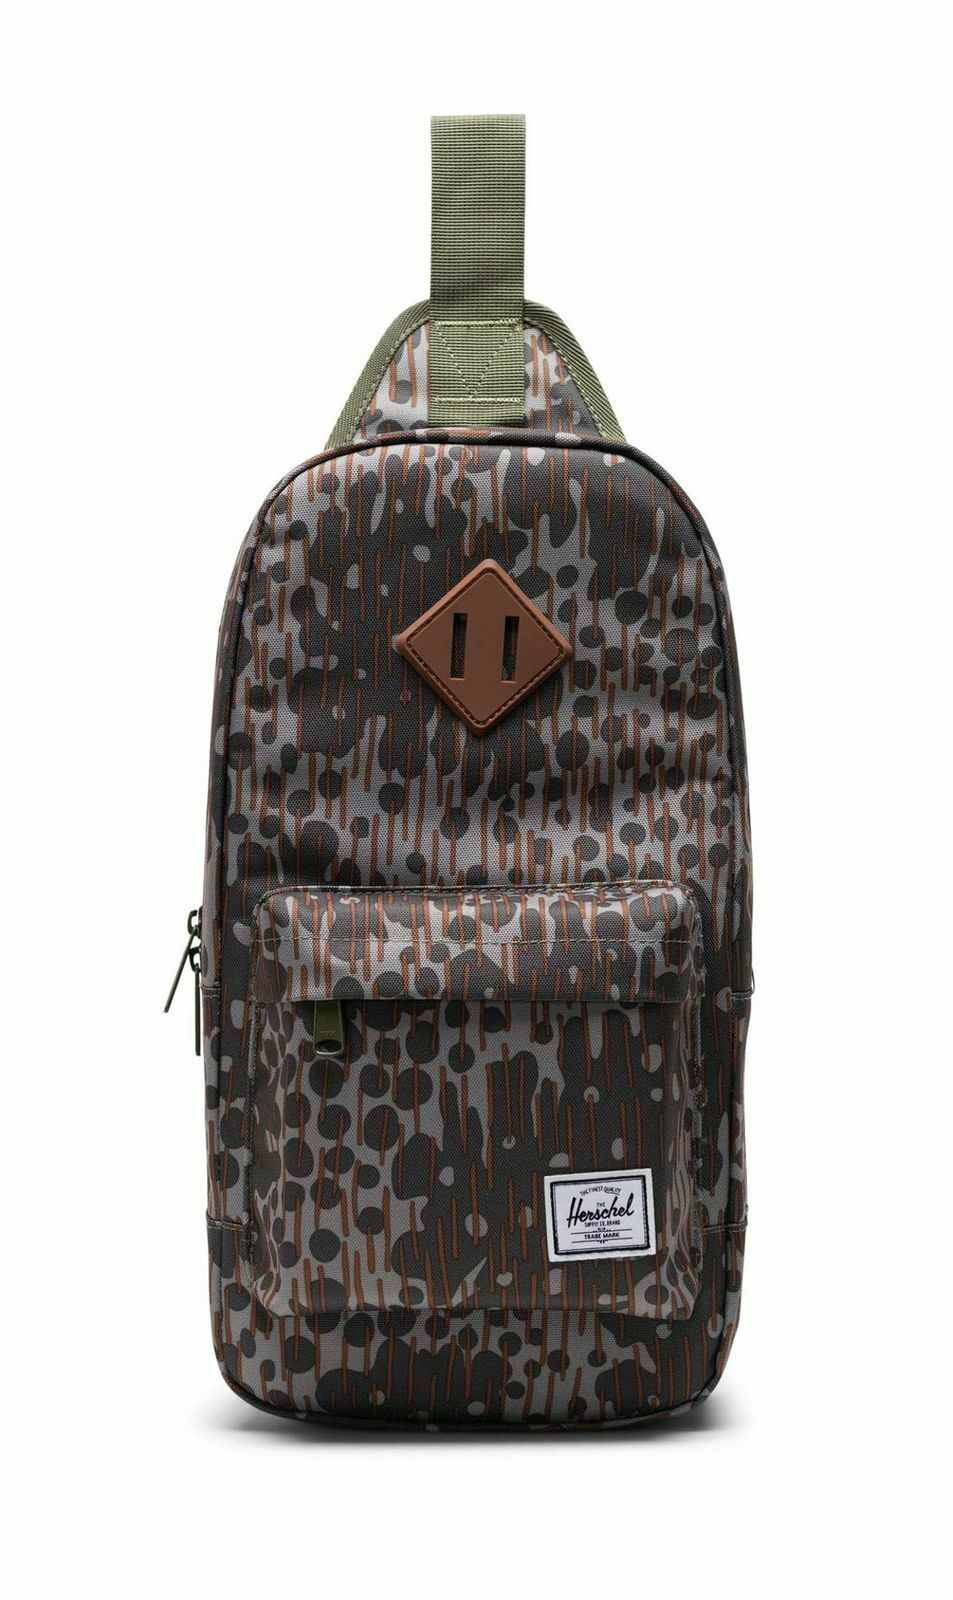 Herschel Heritage Shoulder Bag Sling Bag Green Pea Camo